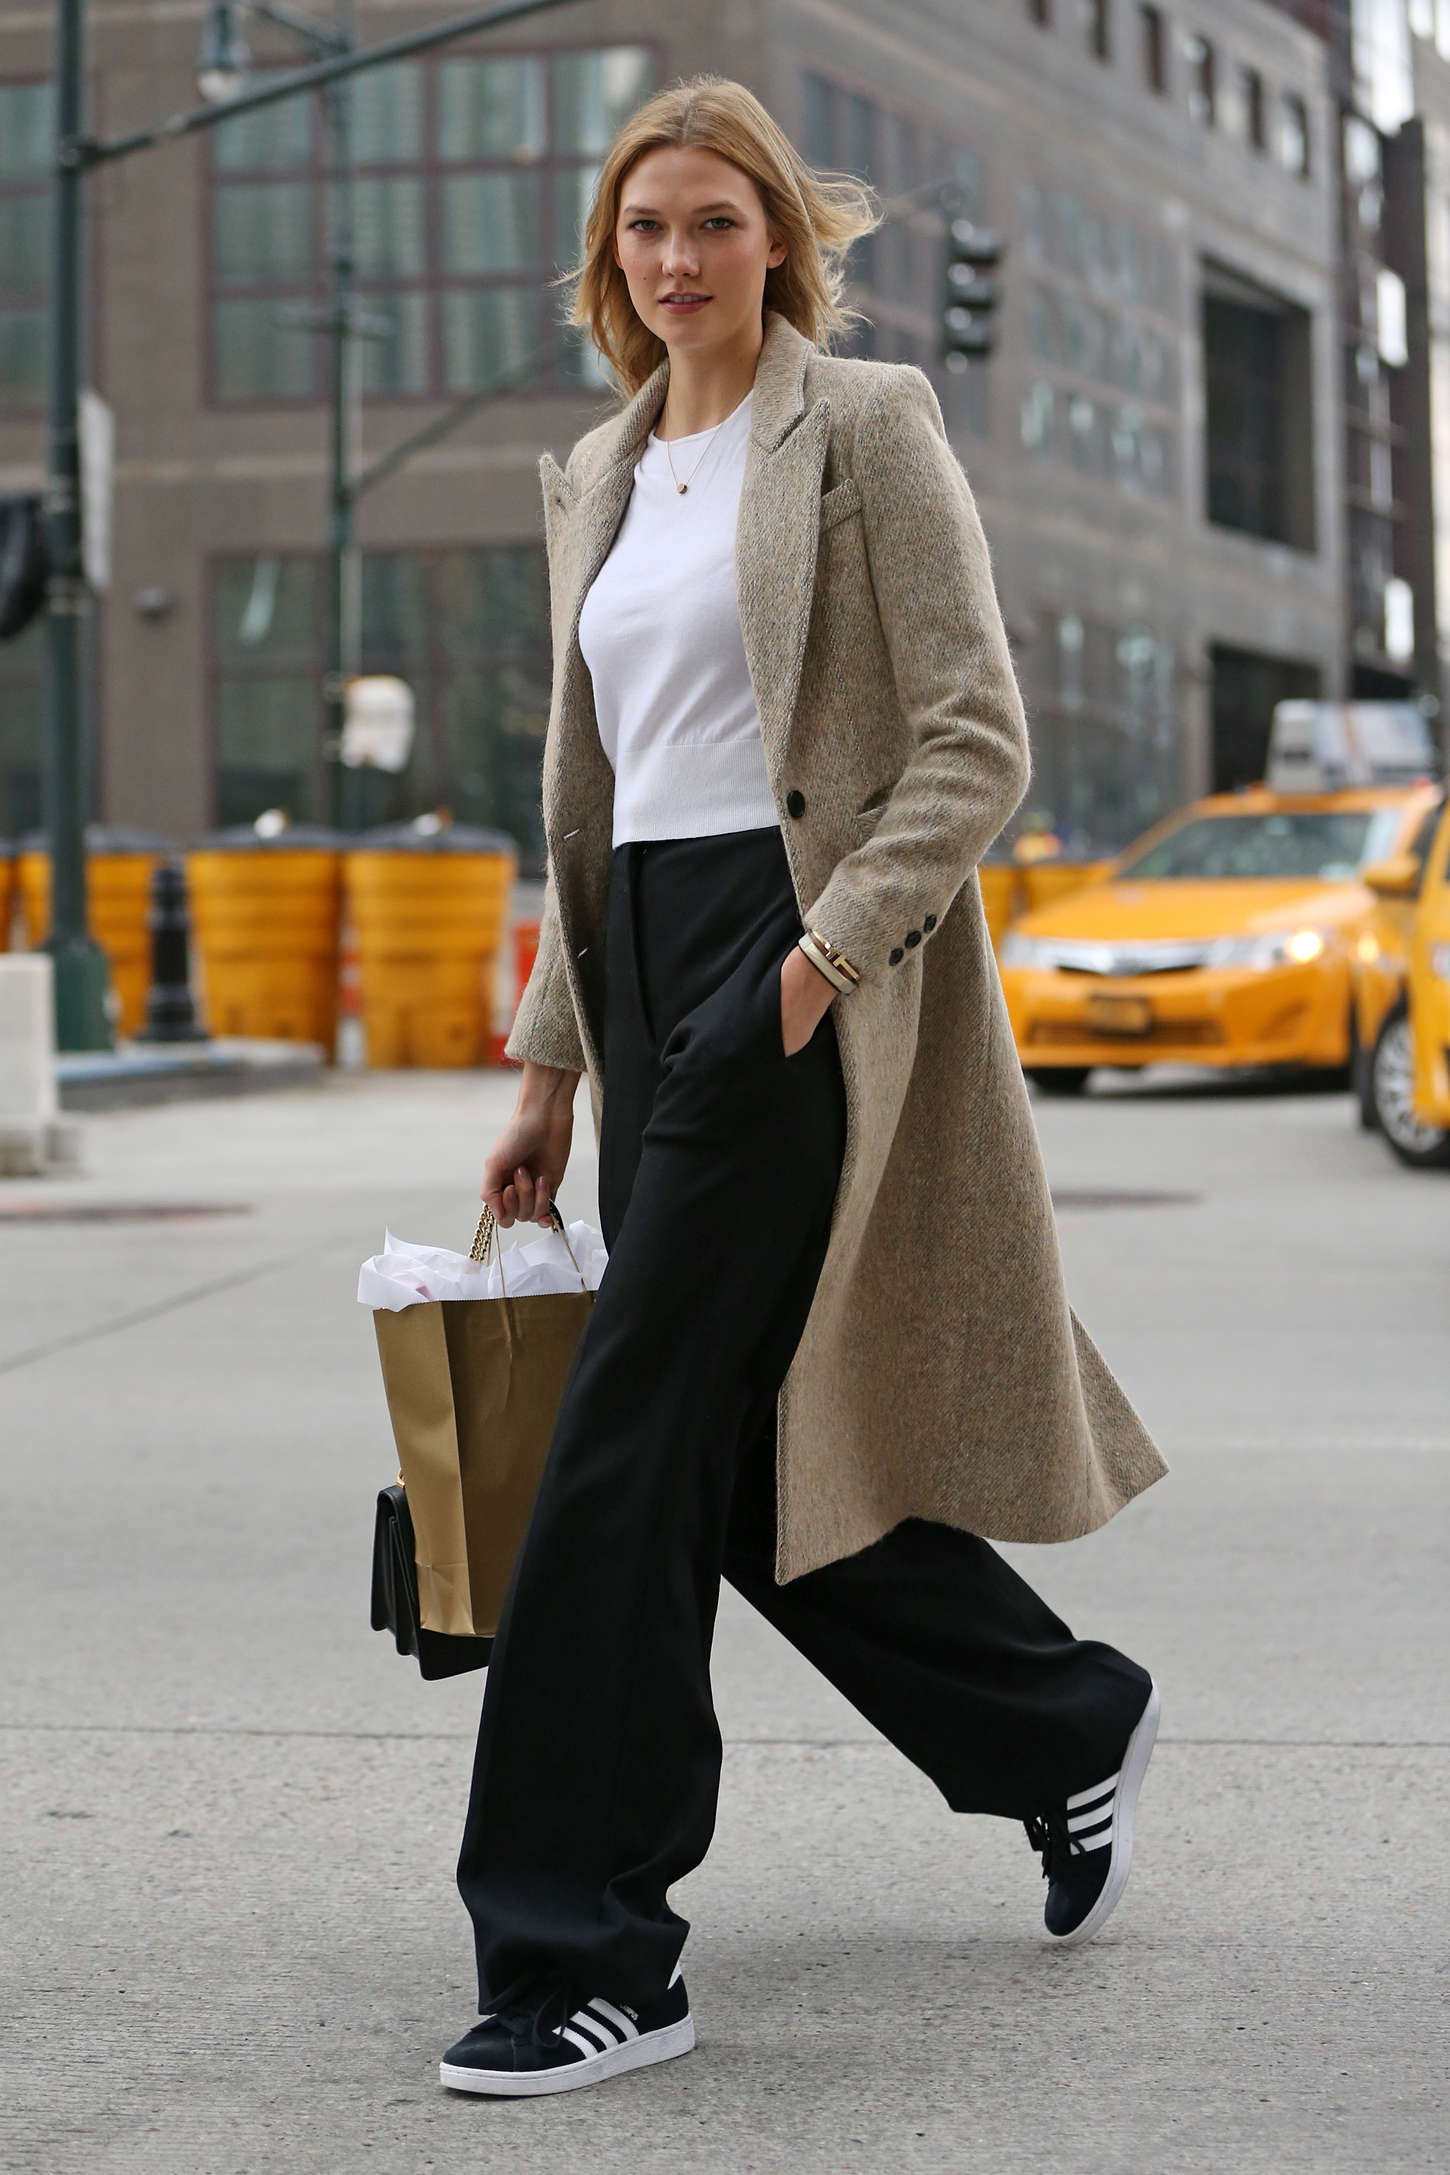 Karlie Kloss 2015 : Karlie Kloss Out in New York City -13